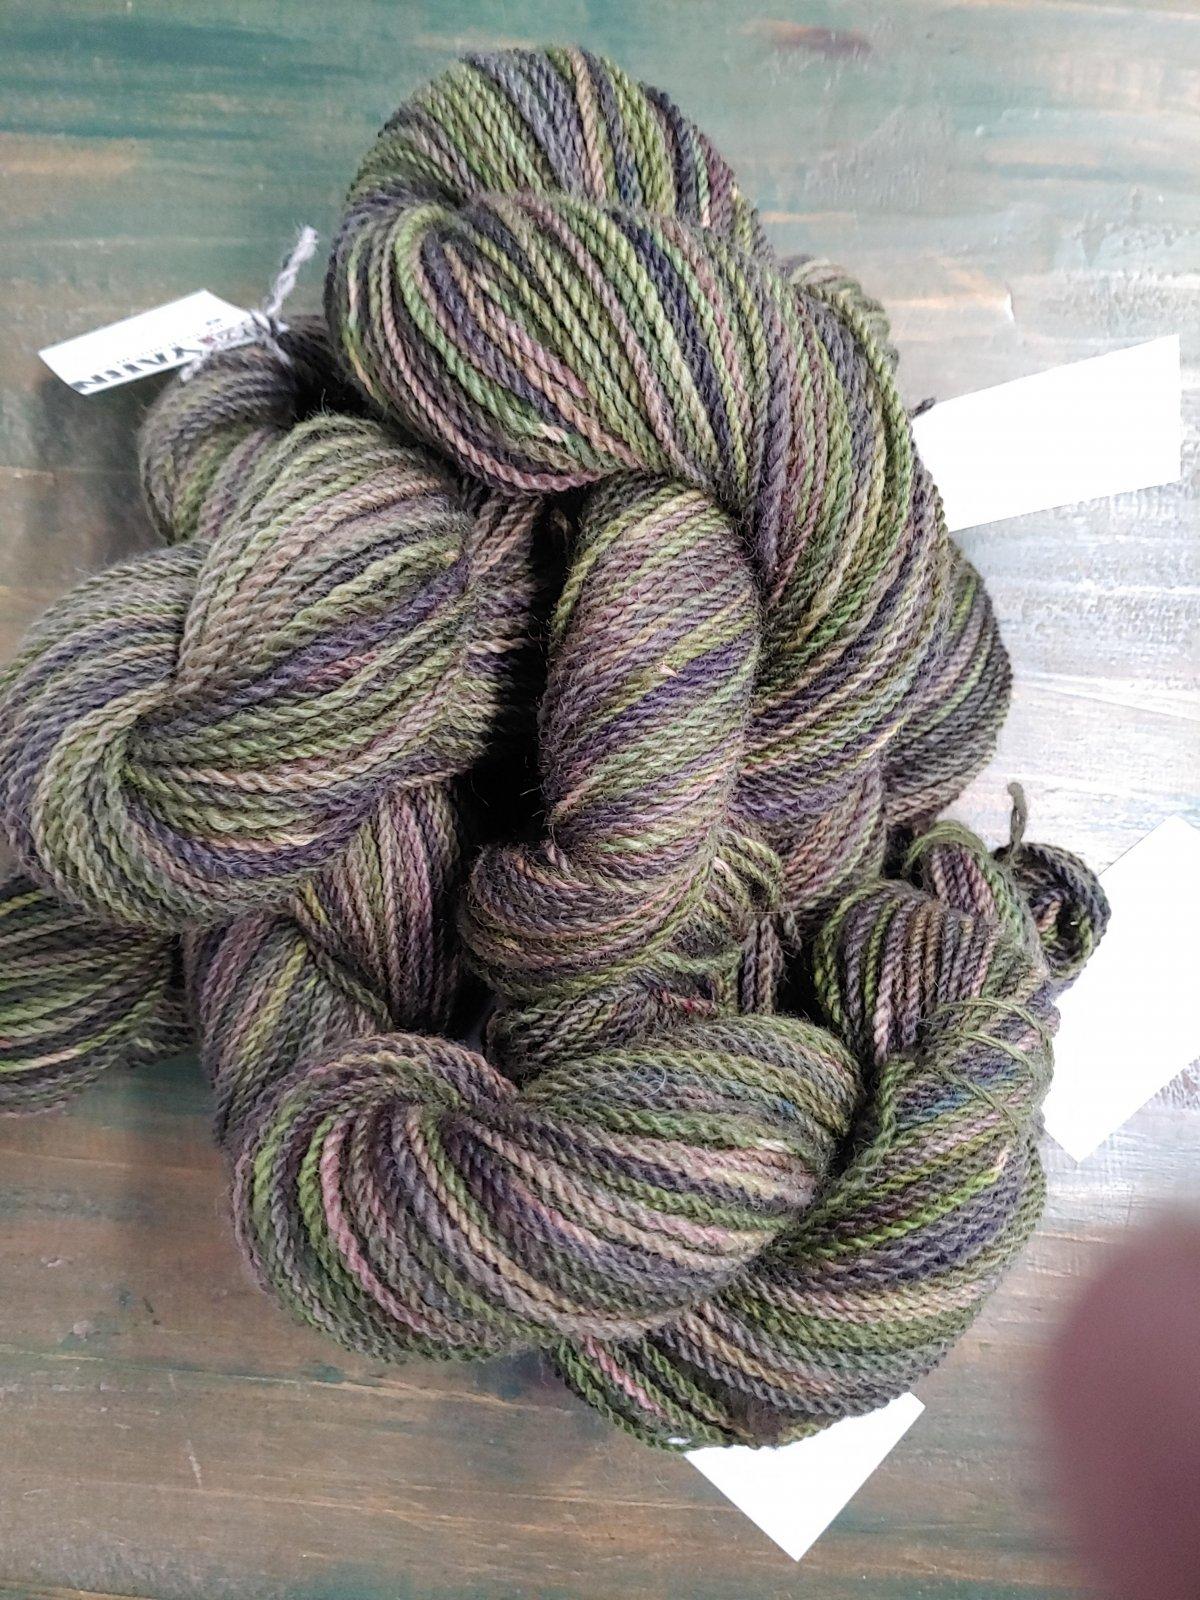 DK Weight Yarn 100% Alpaca Dyed Colors